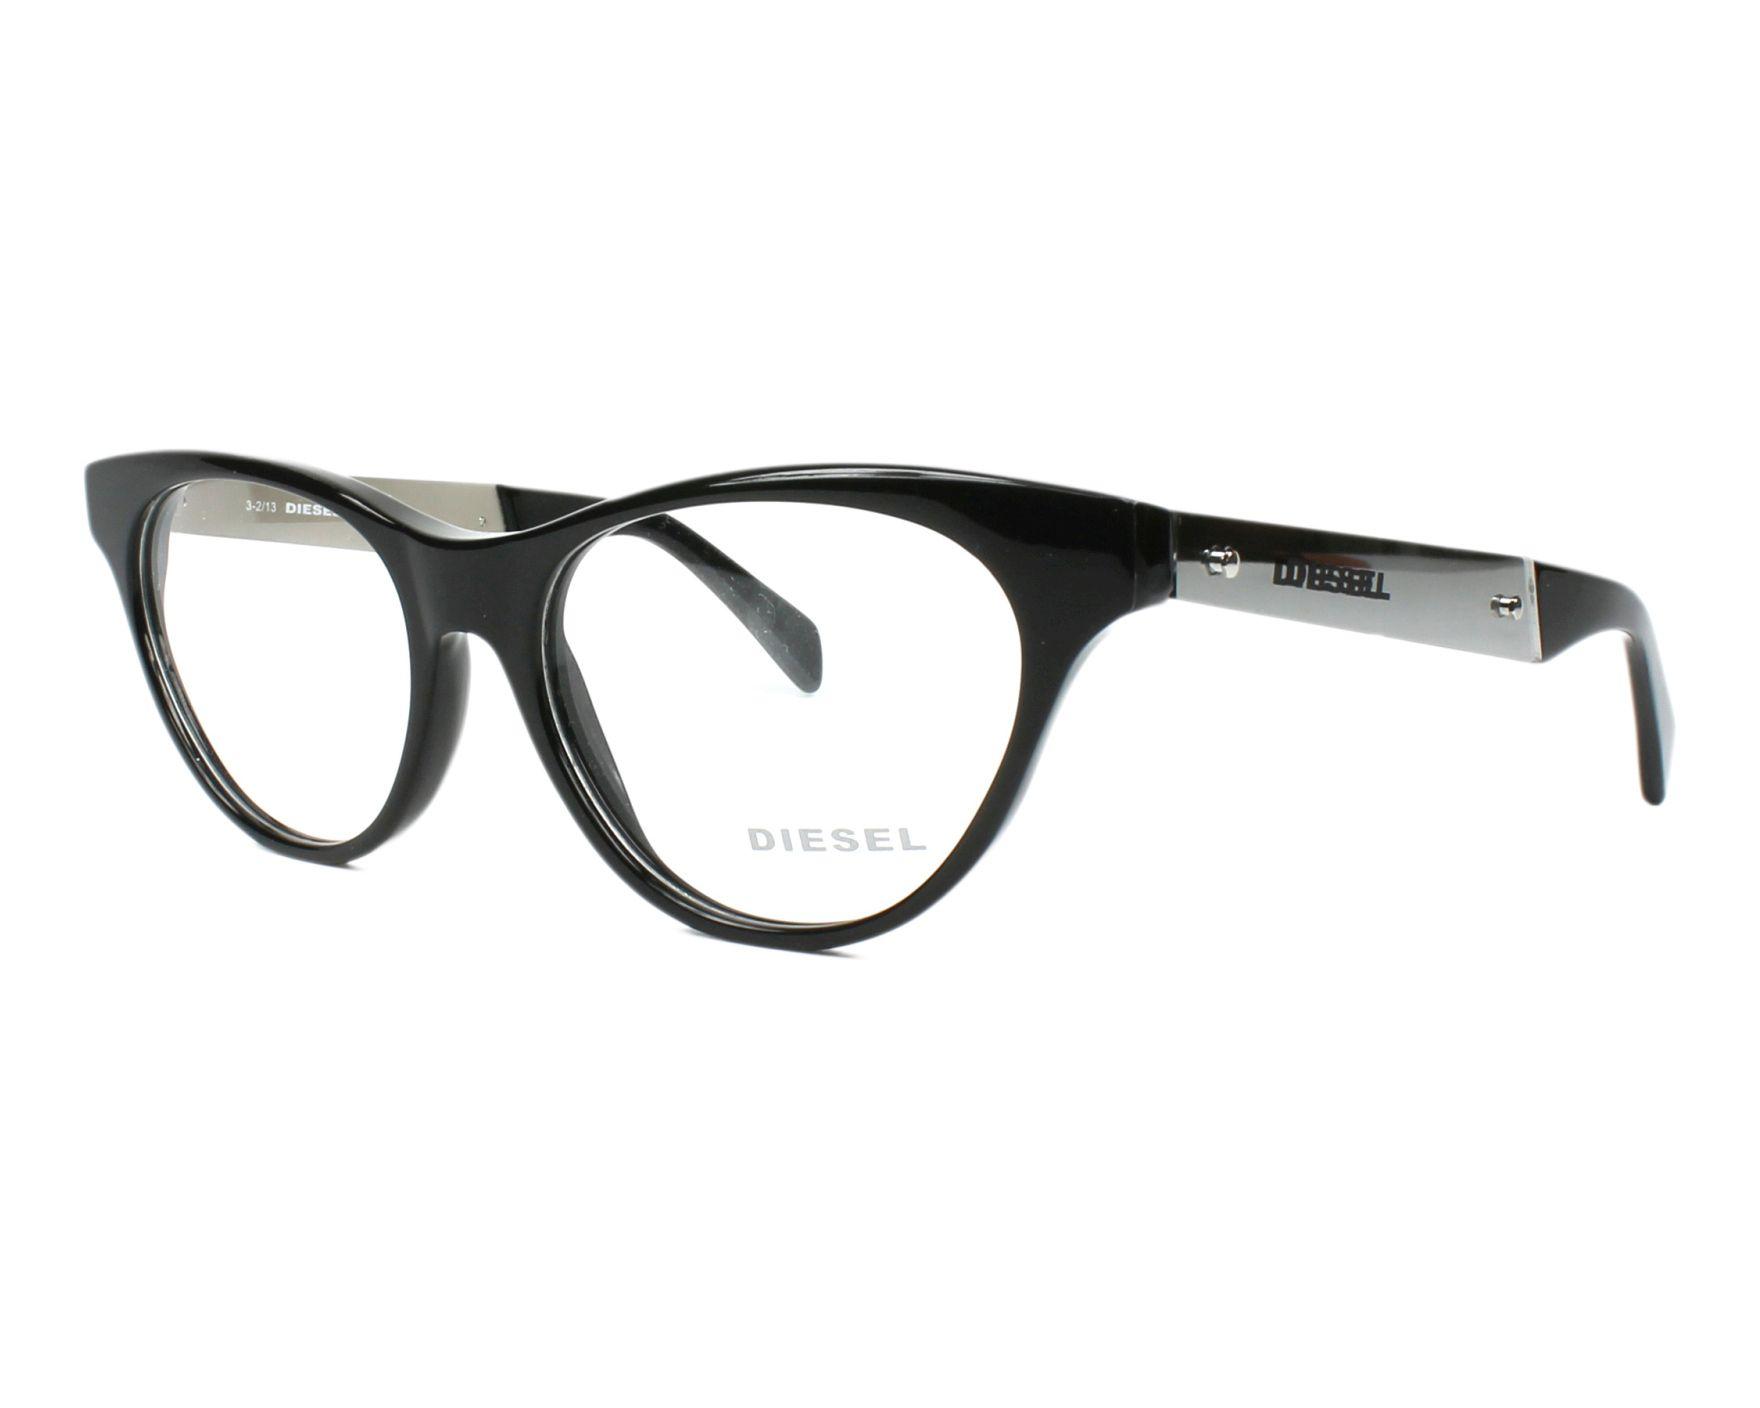 dc3e425991c eyeglasses Diesel DL-5059 001 52-16 Black Silver profile view